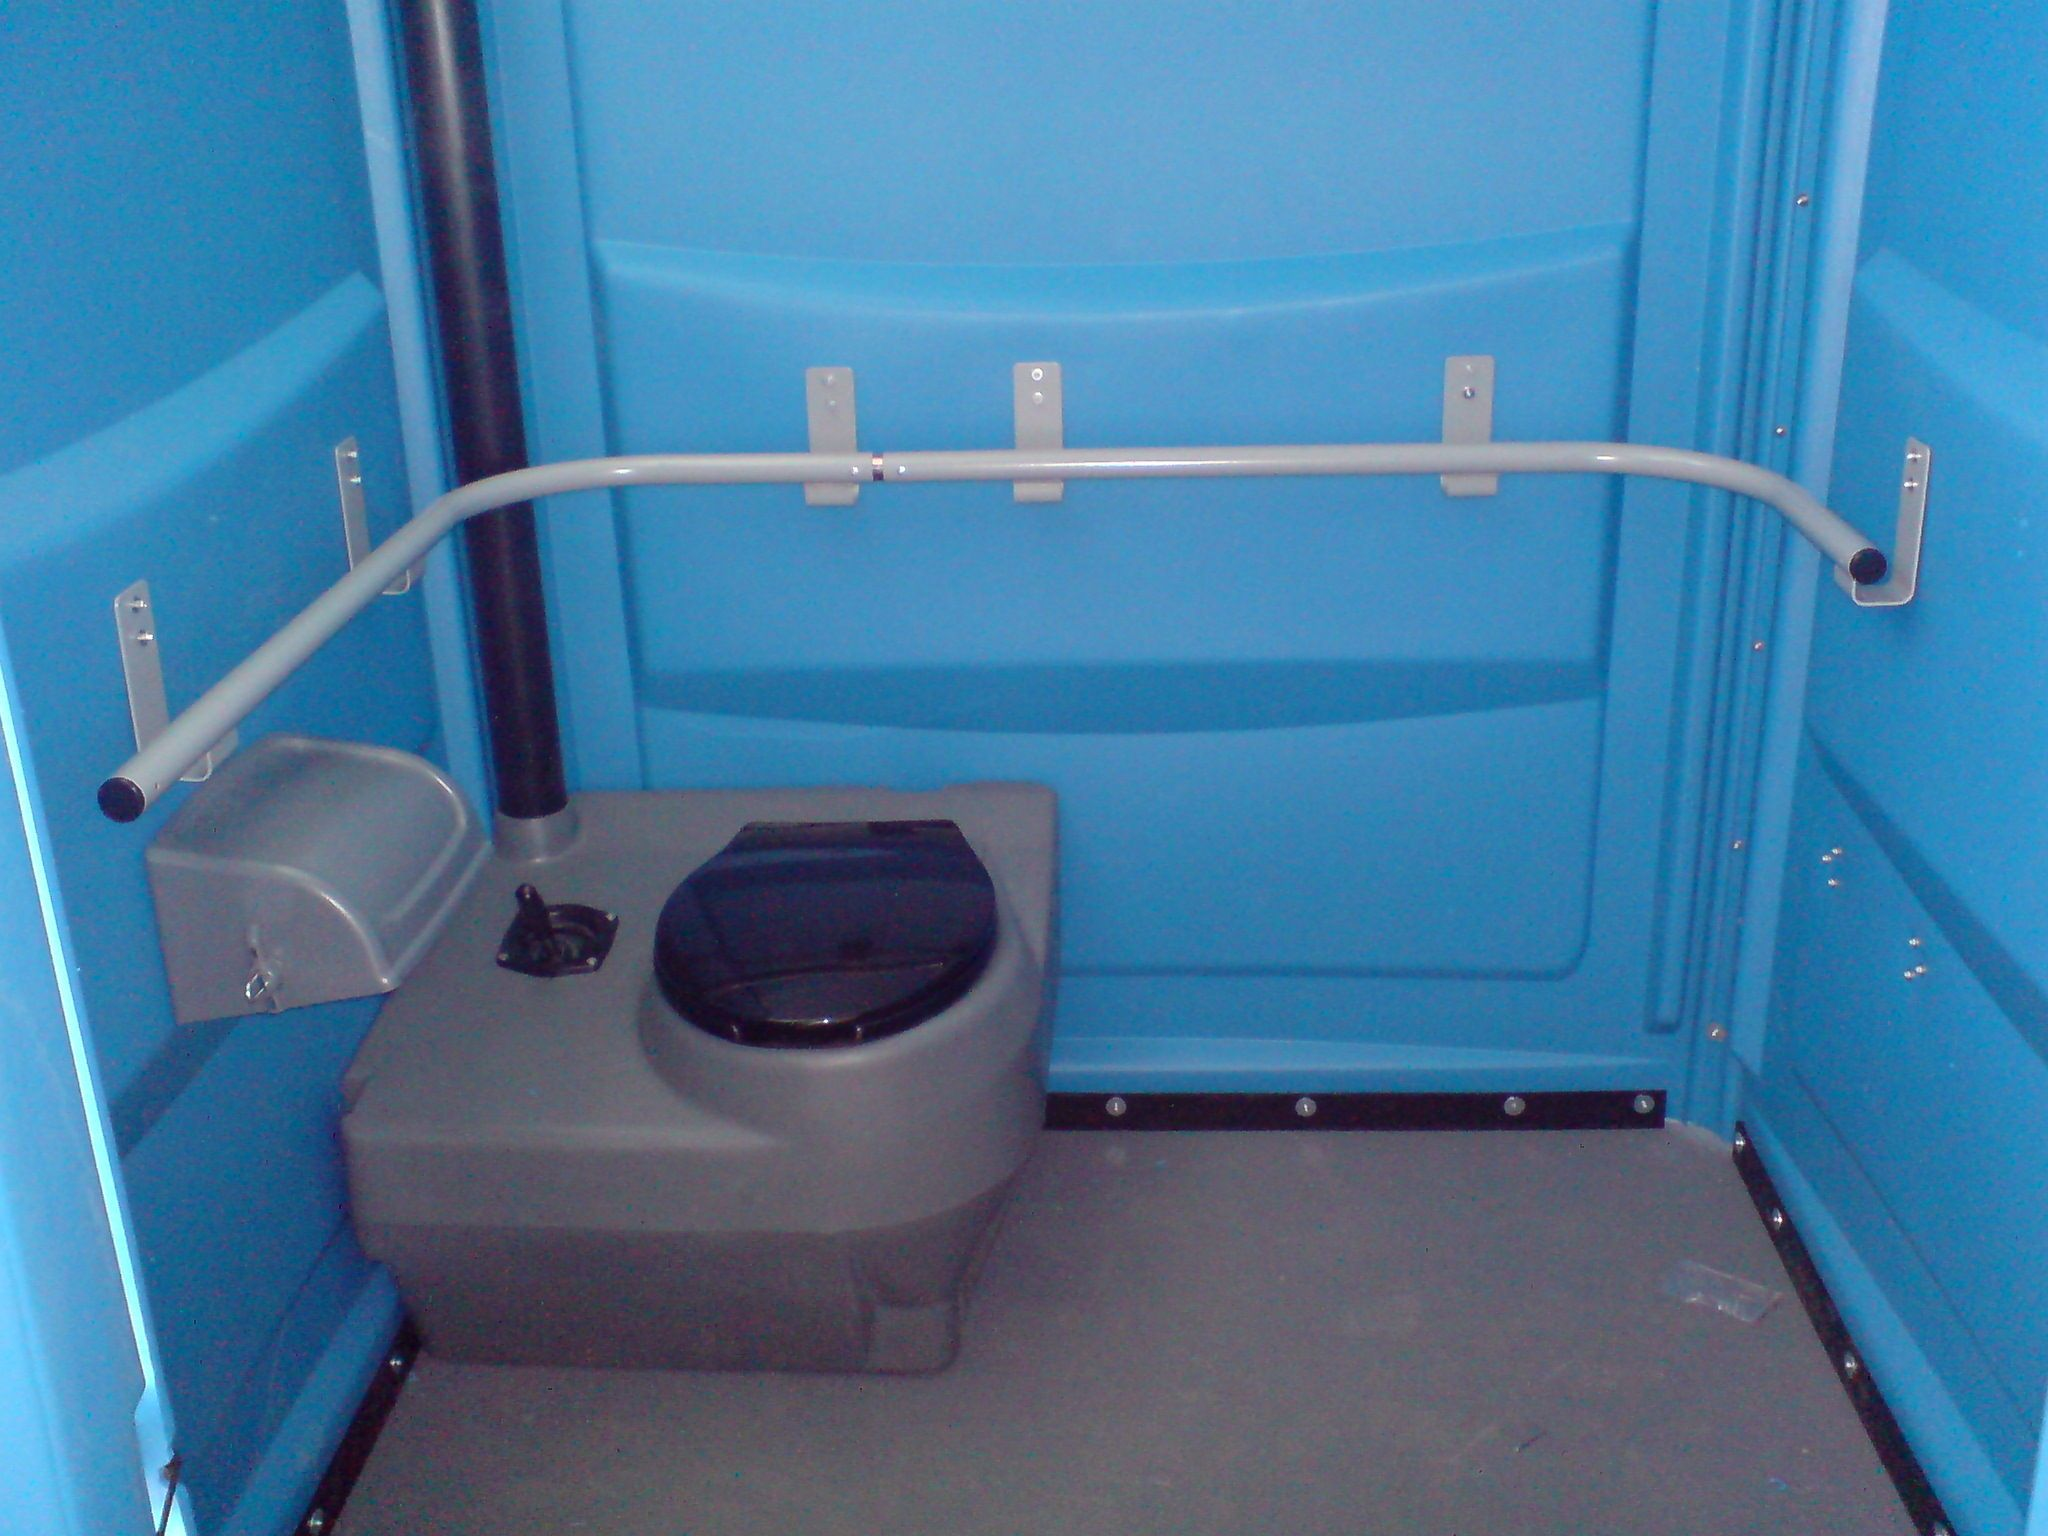 Alquiler de sanitarios port tiles Boxi Mobil WC